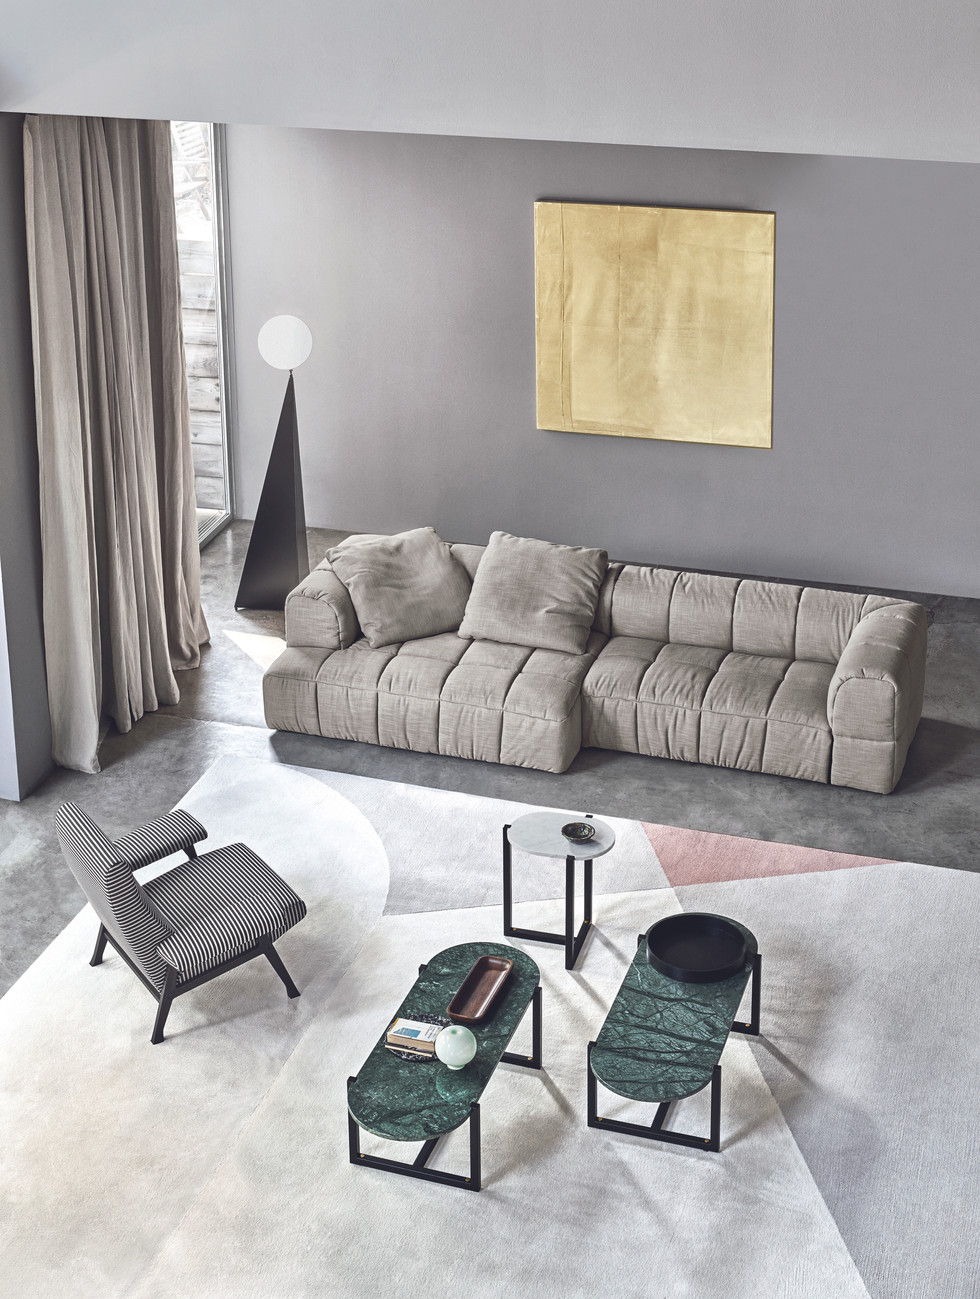 arflex-sigmund-design-studio-asai_amb1j